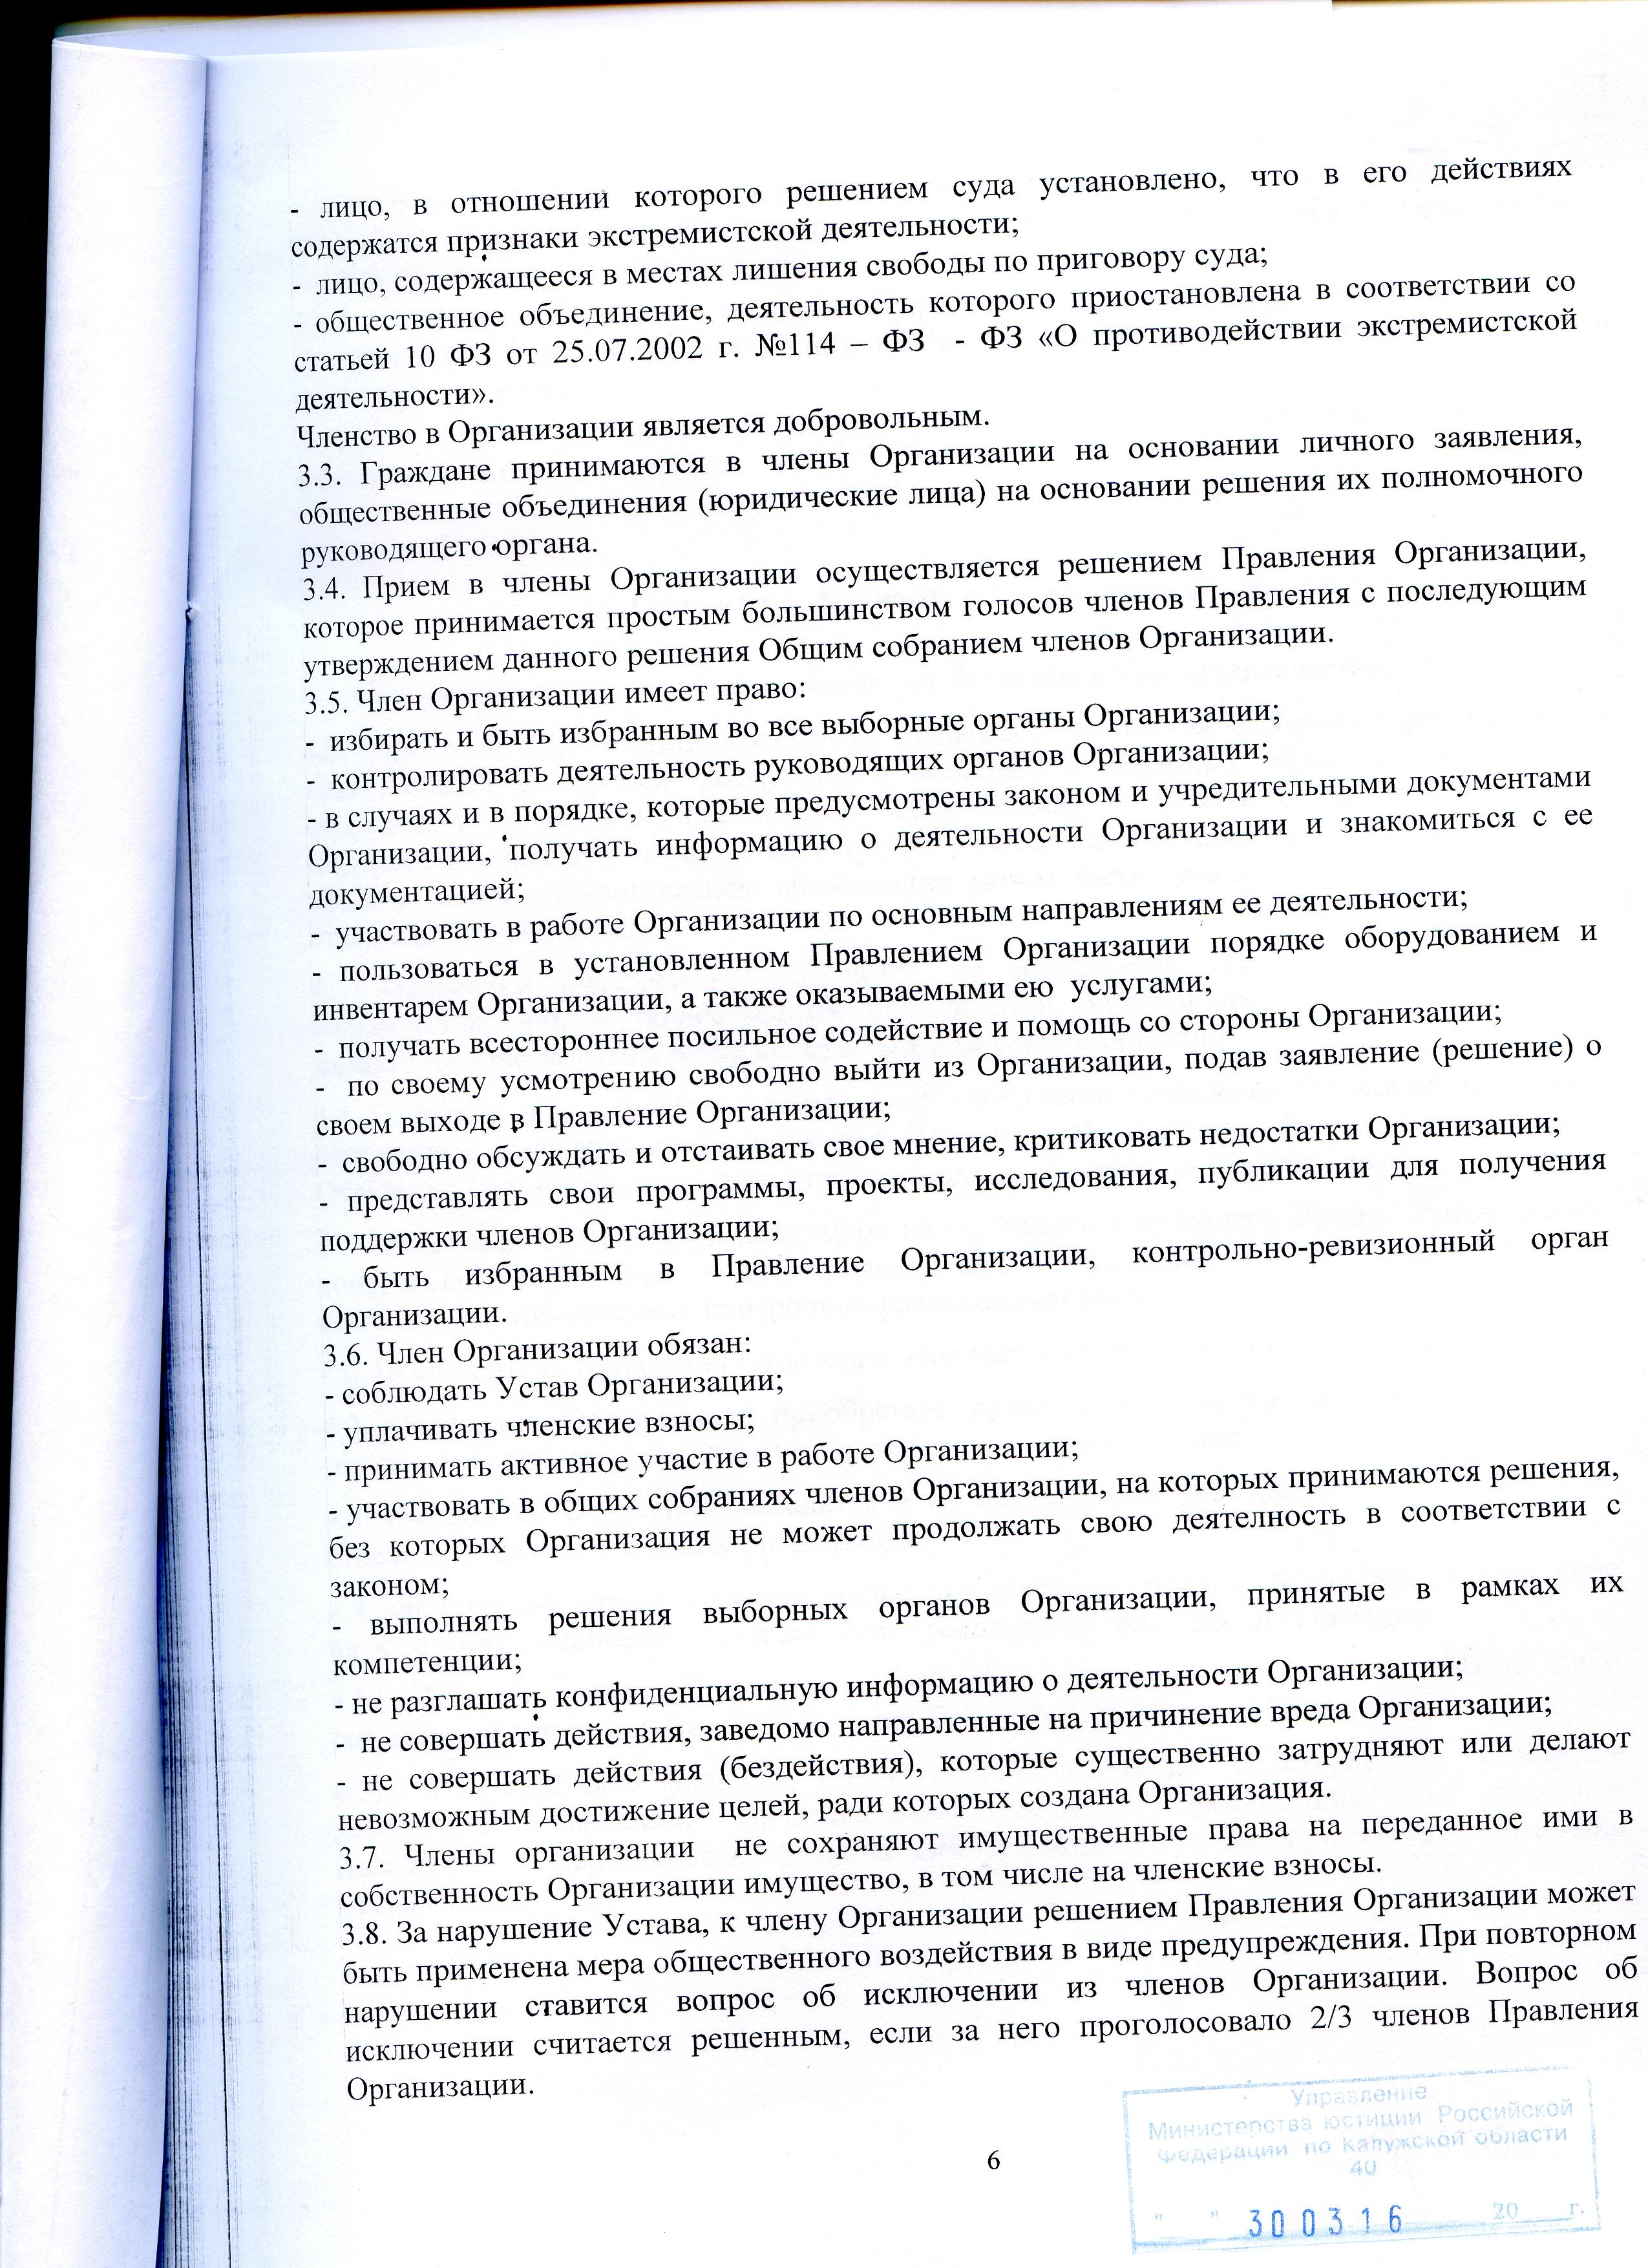 Устав НД 2 редакция067